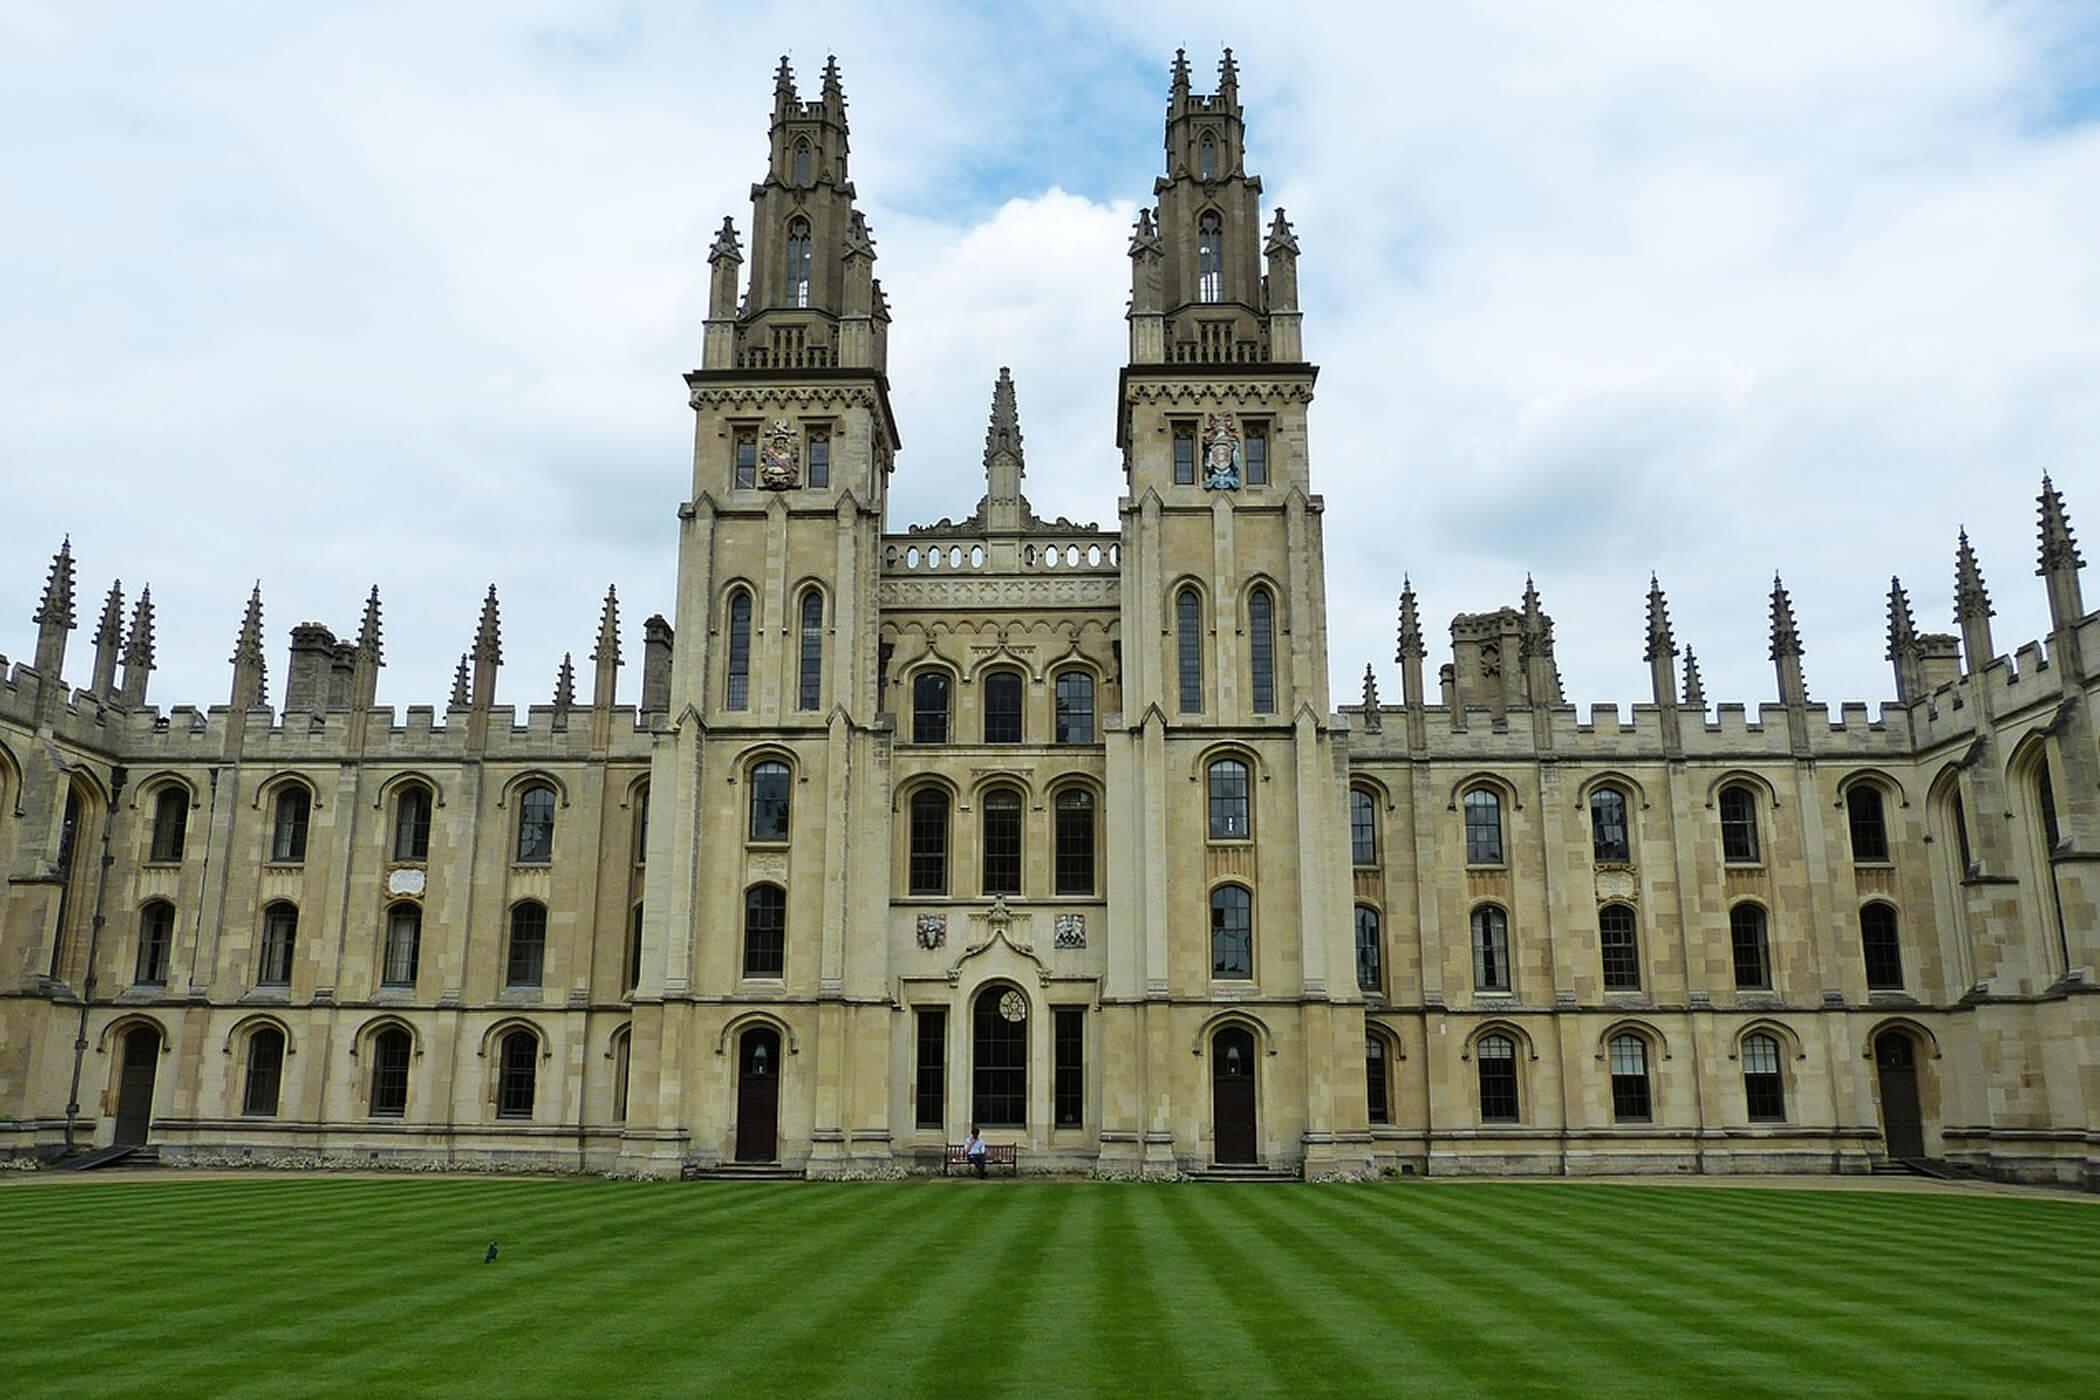 Top Universities in the World 2020